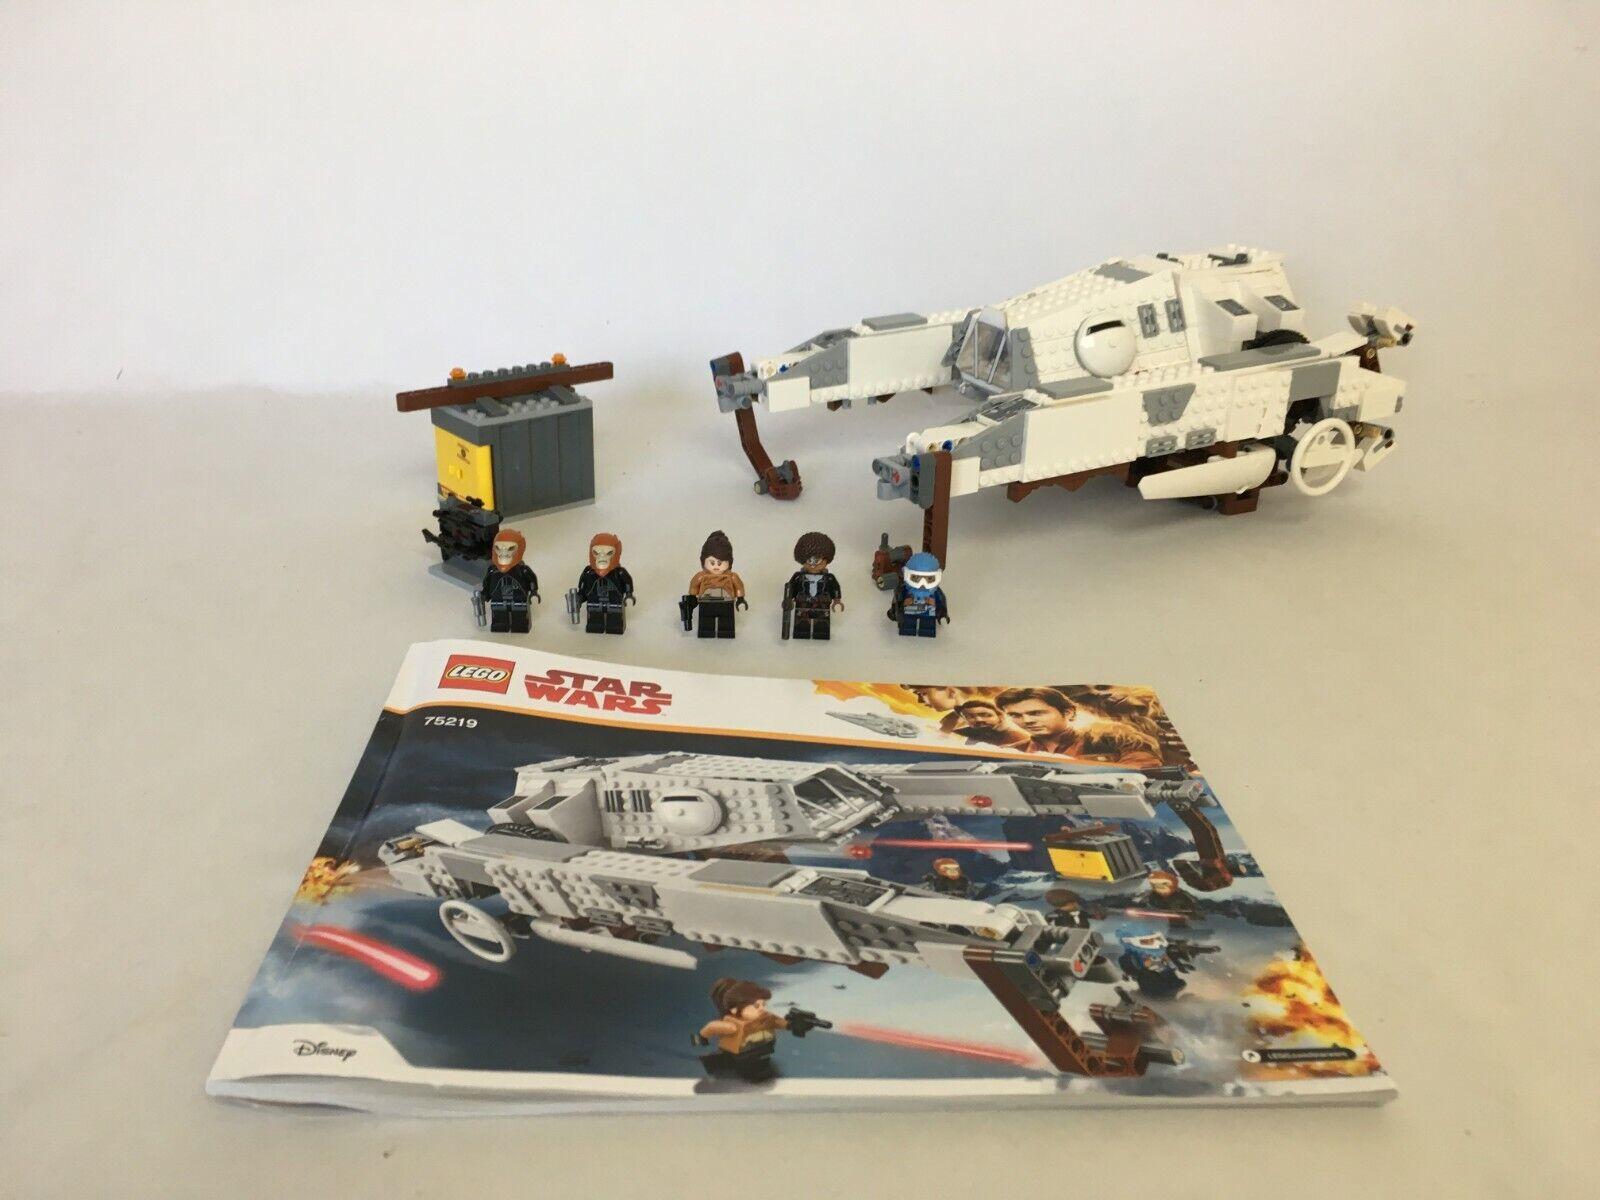 LEGO® Star Wars 75219 AT-Hauler